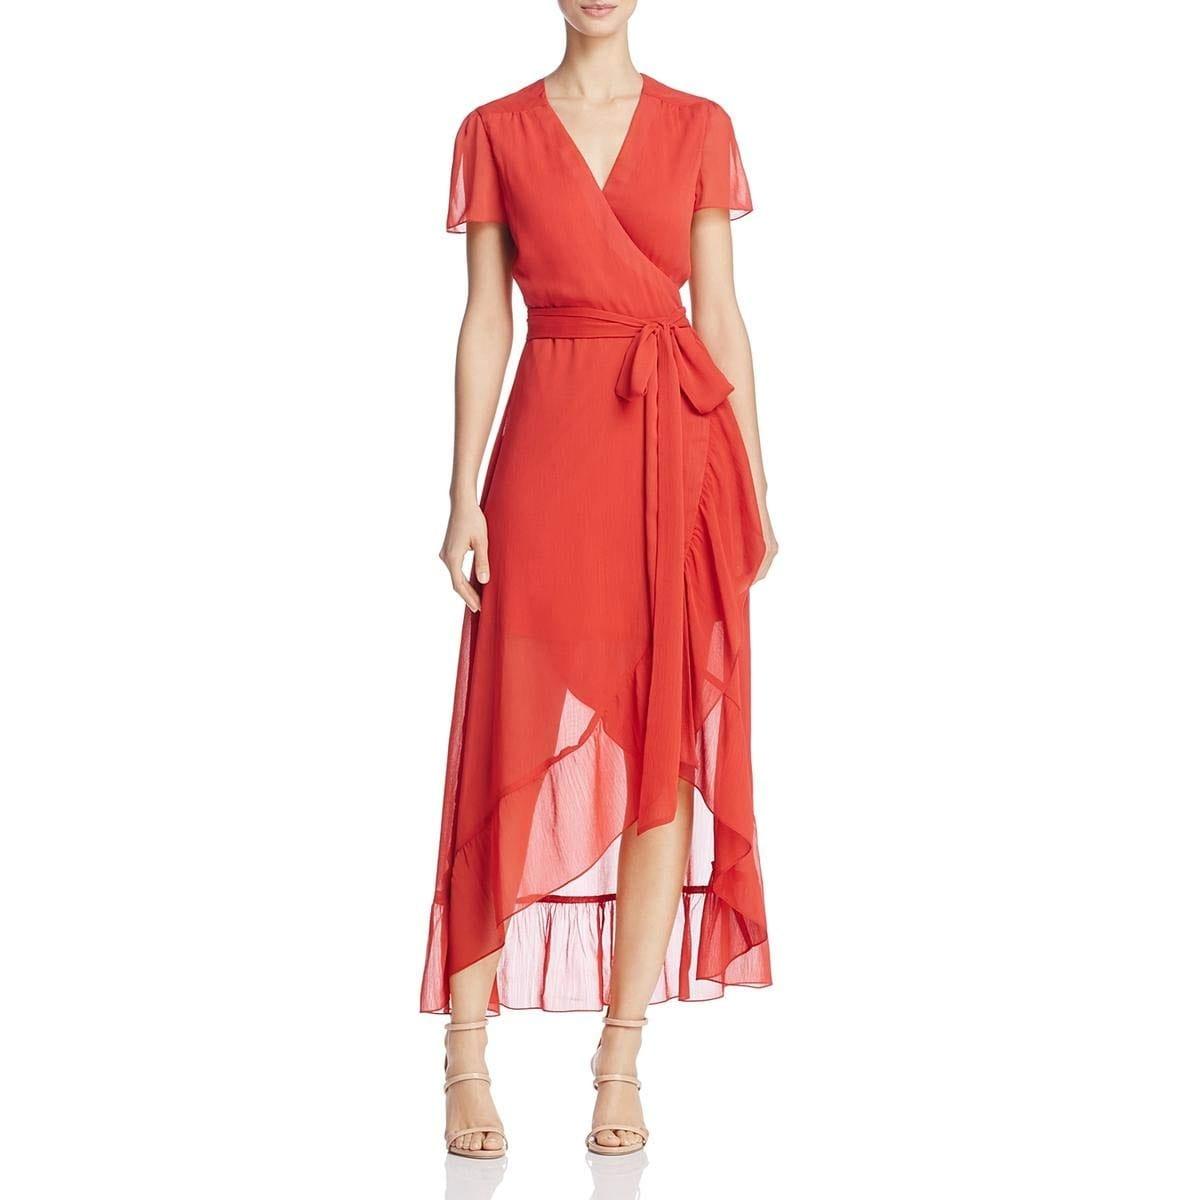 ff7c18cf606c Buy WAYF Party Dresses Online at Overstock | Our Best Dresses Deals